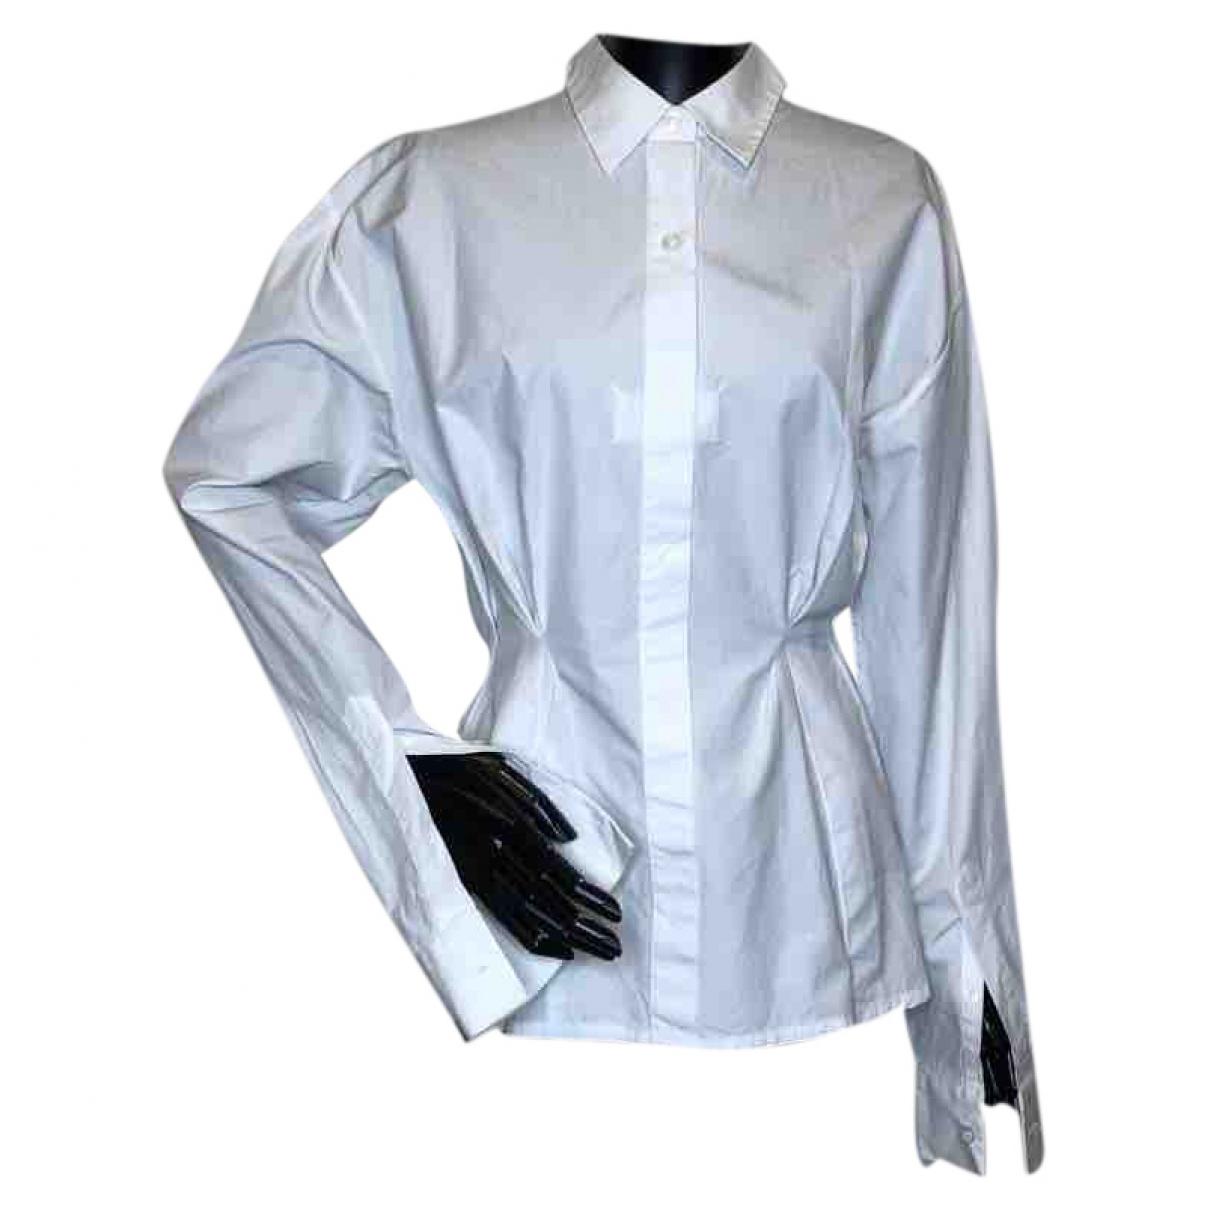 Maison Martin Margiela \N White Cotton  top for Women 40 IT